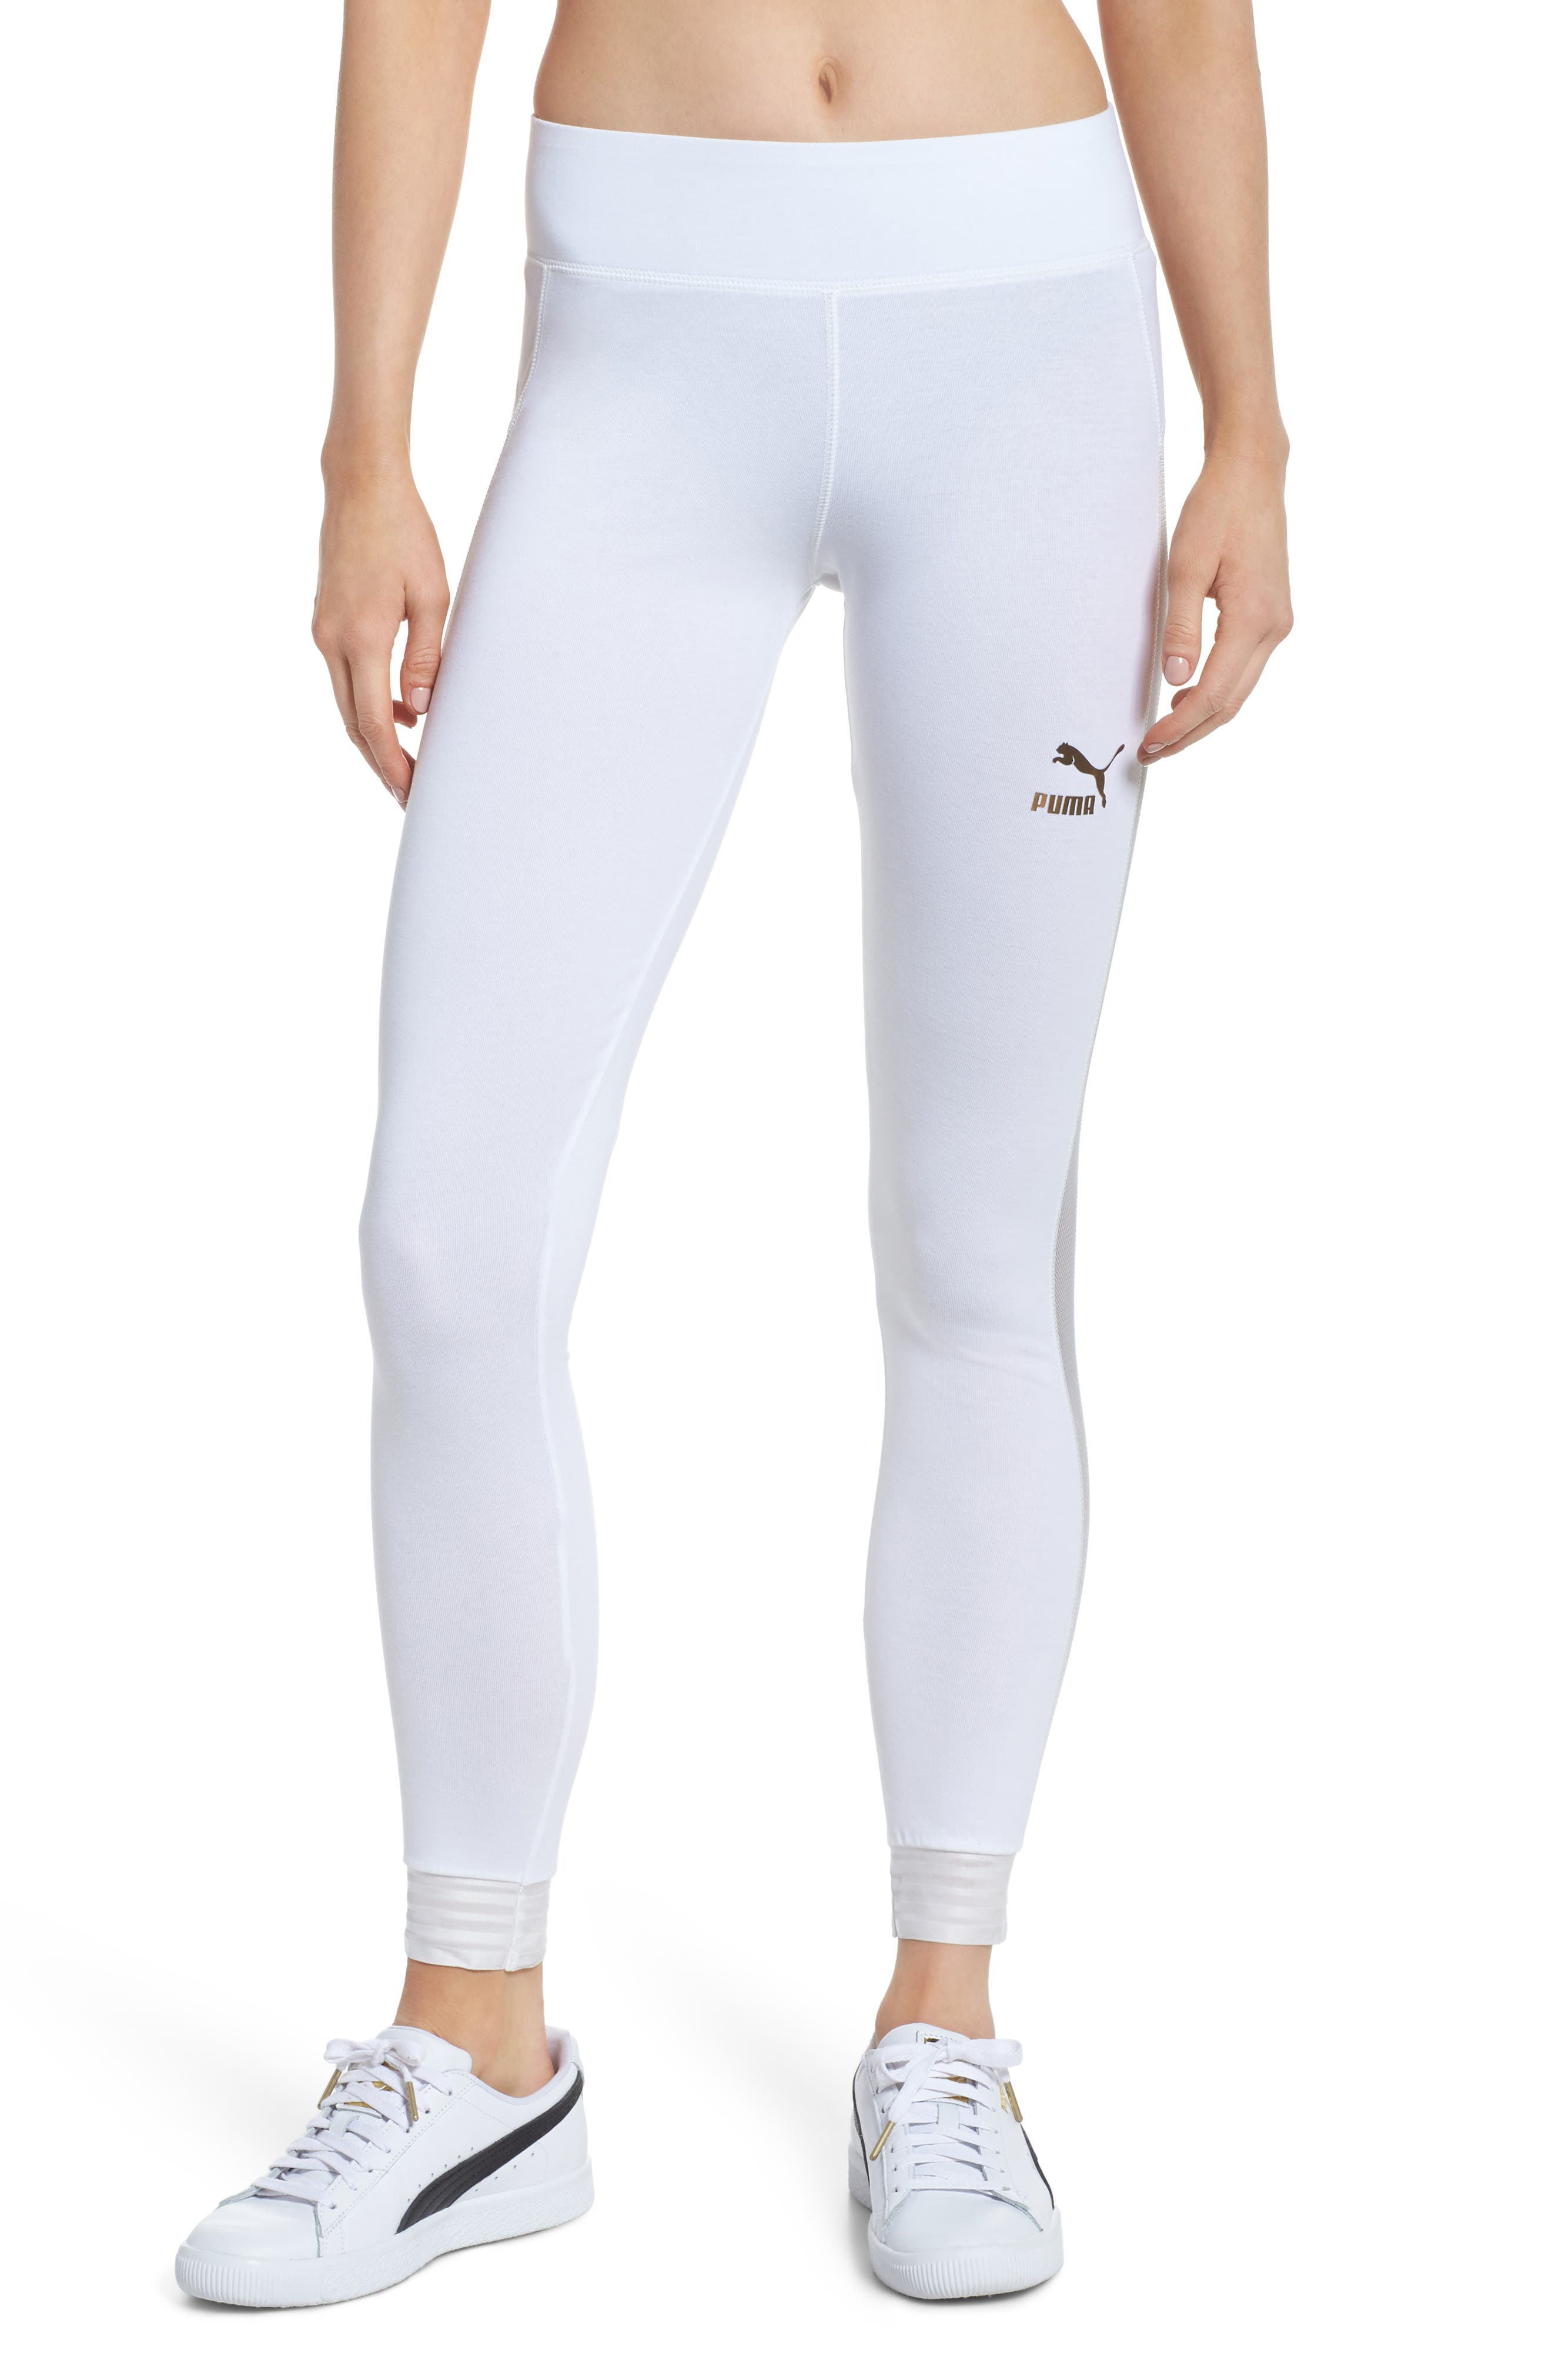 T7 Leggings,                         Main,                         color, PUMA WHITE